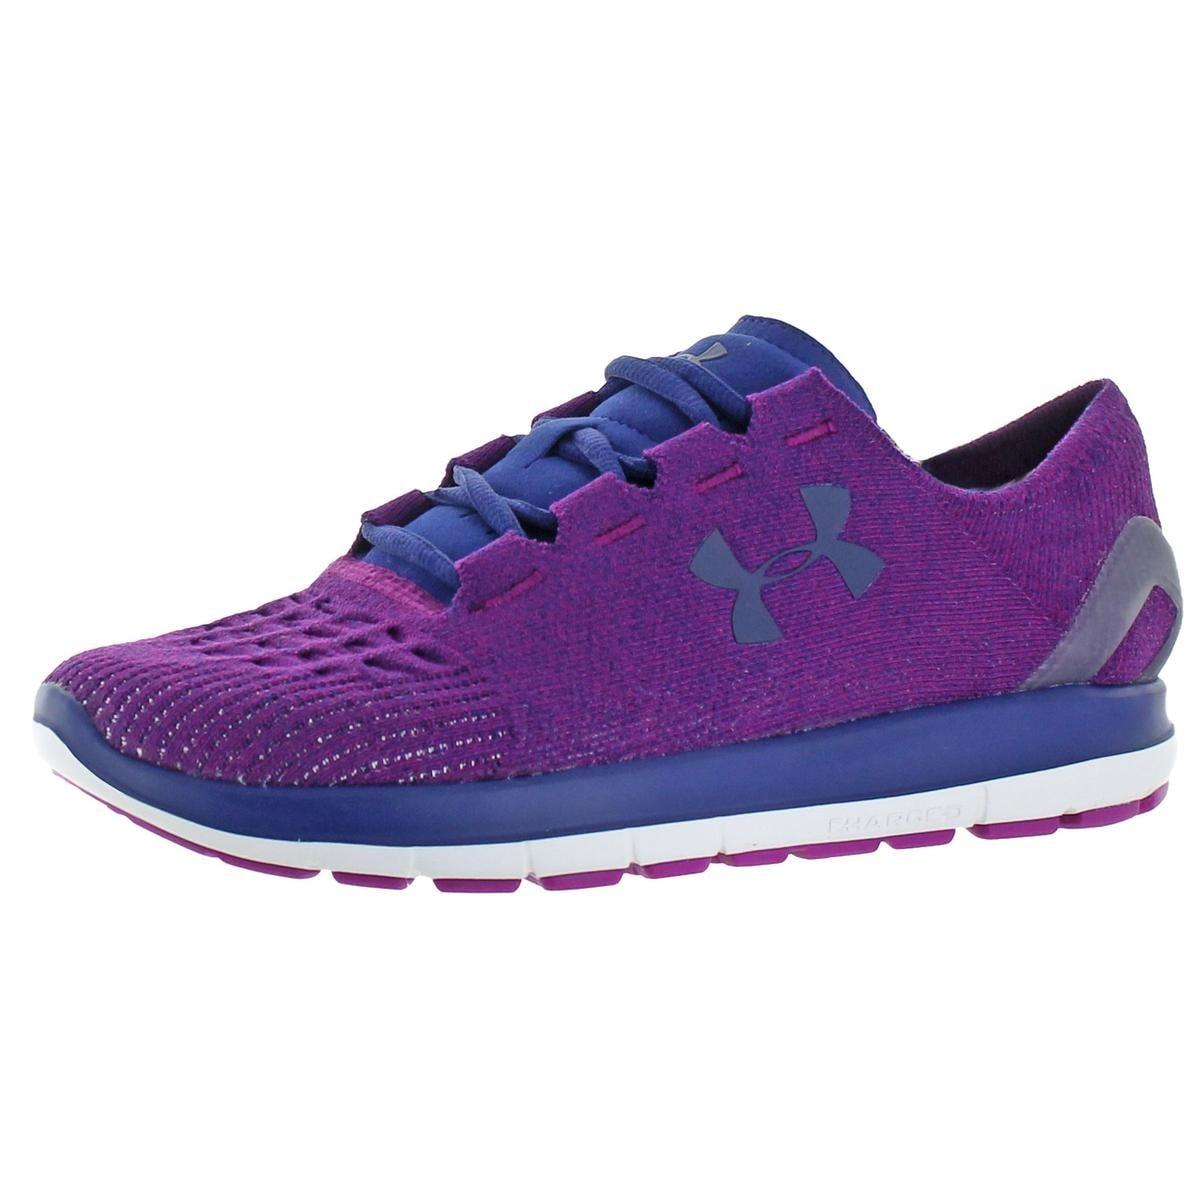 94508394 Under Armour Womens Speedform Slingride Running Shoes Charged Fitness - 10  medium (b,m)